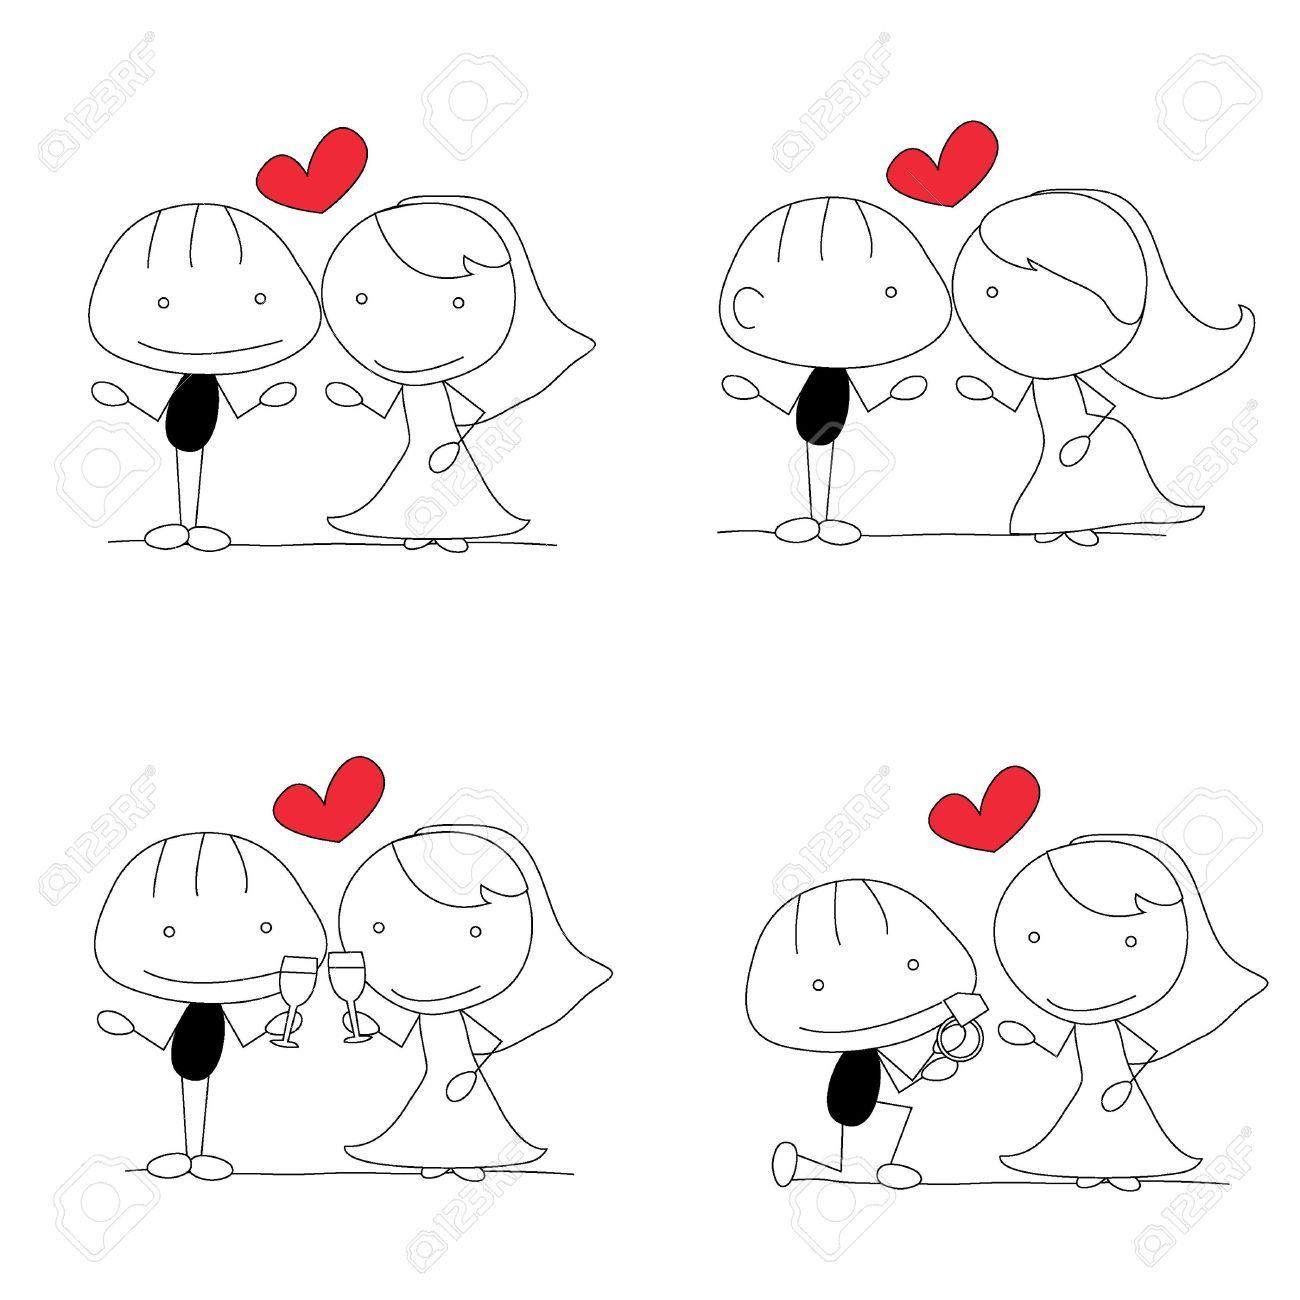 Cute Stick Figures 20170961-nine-cute-sti...